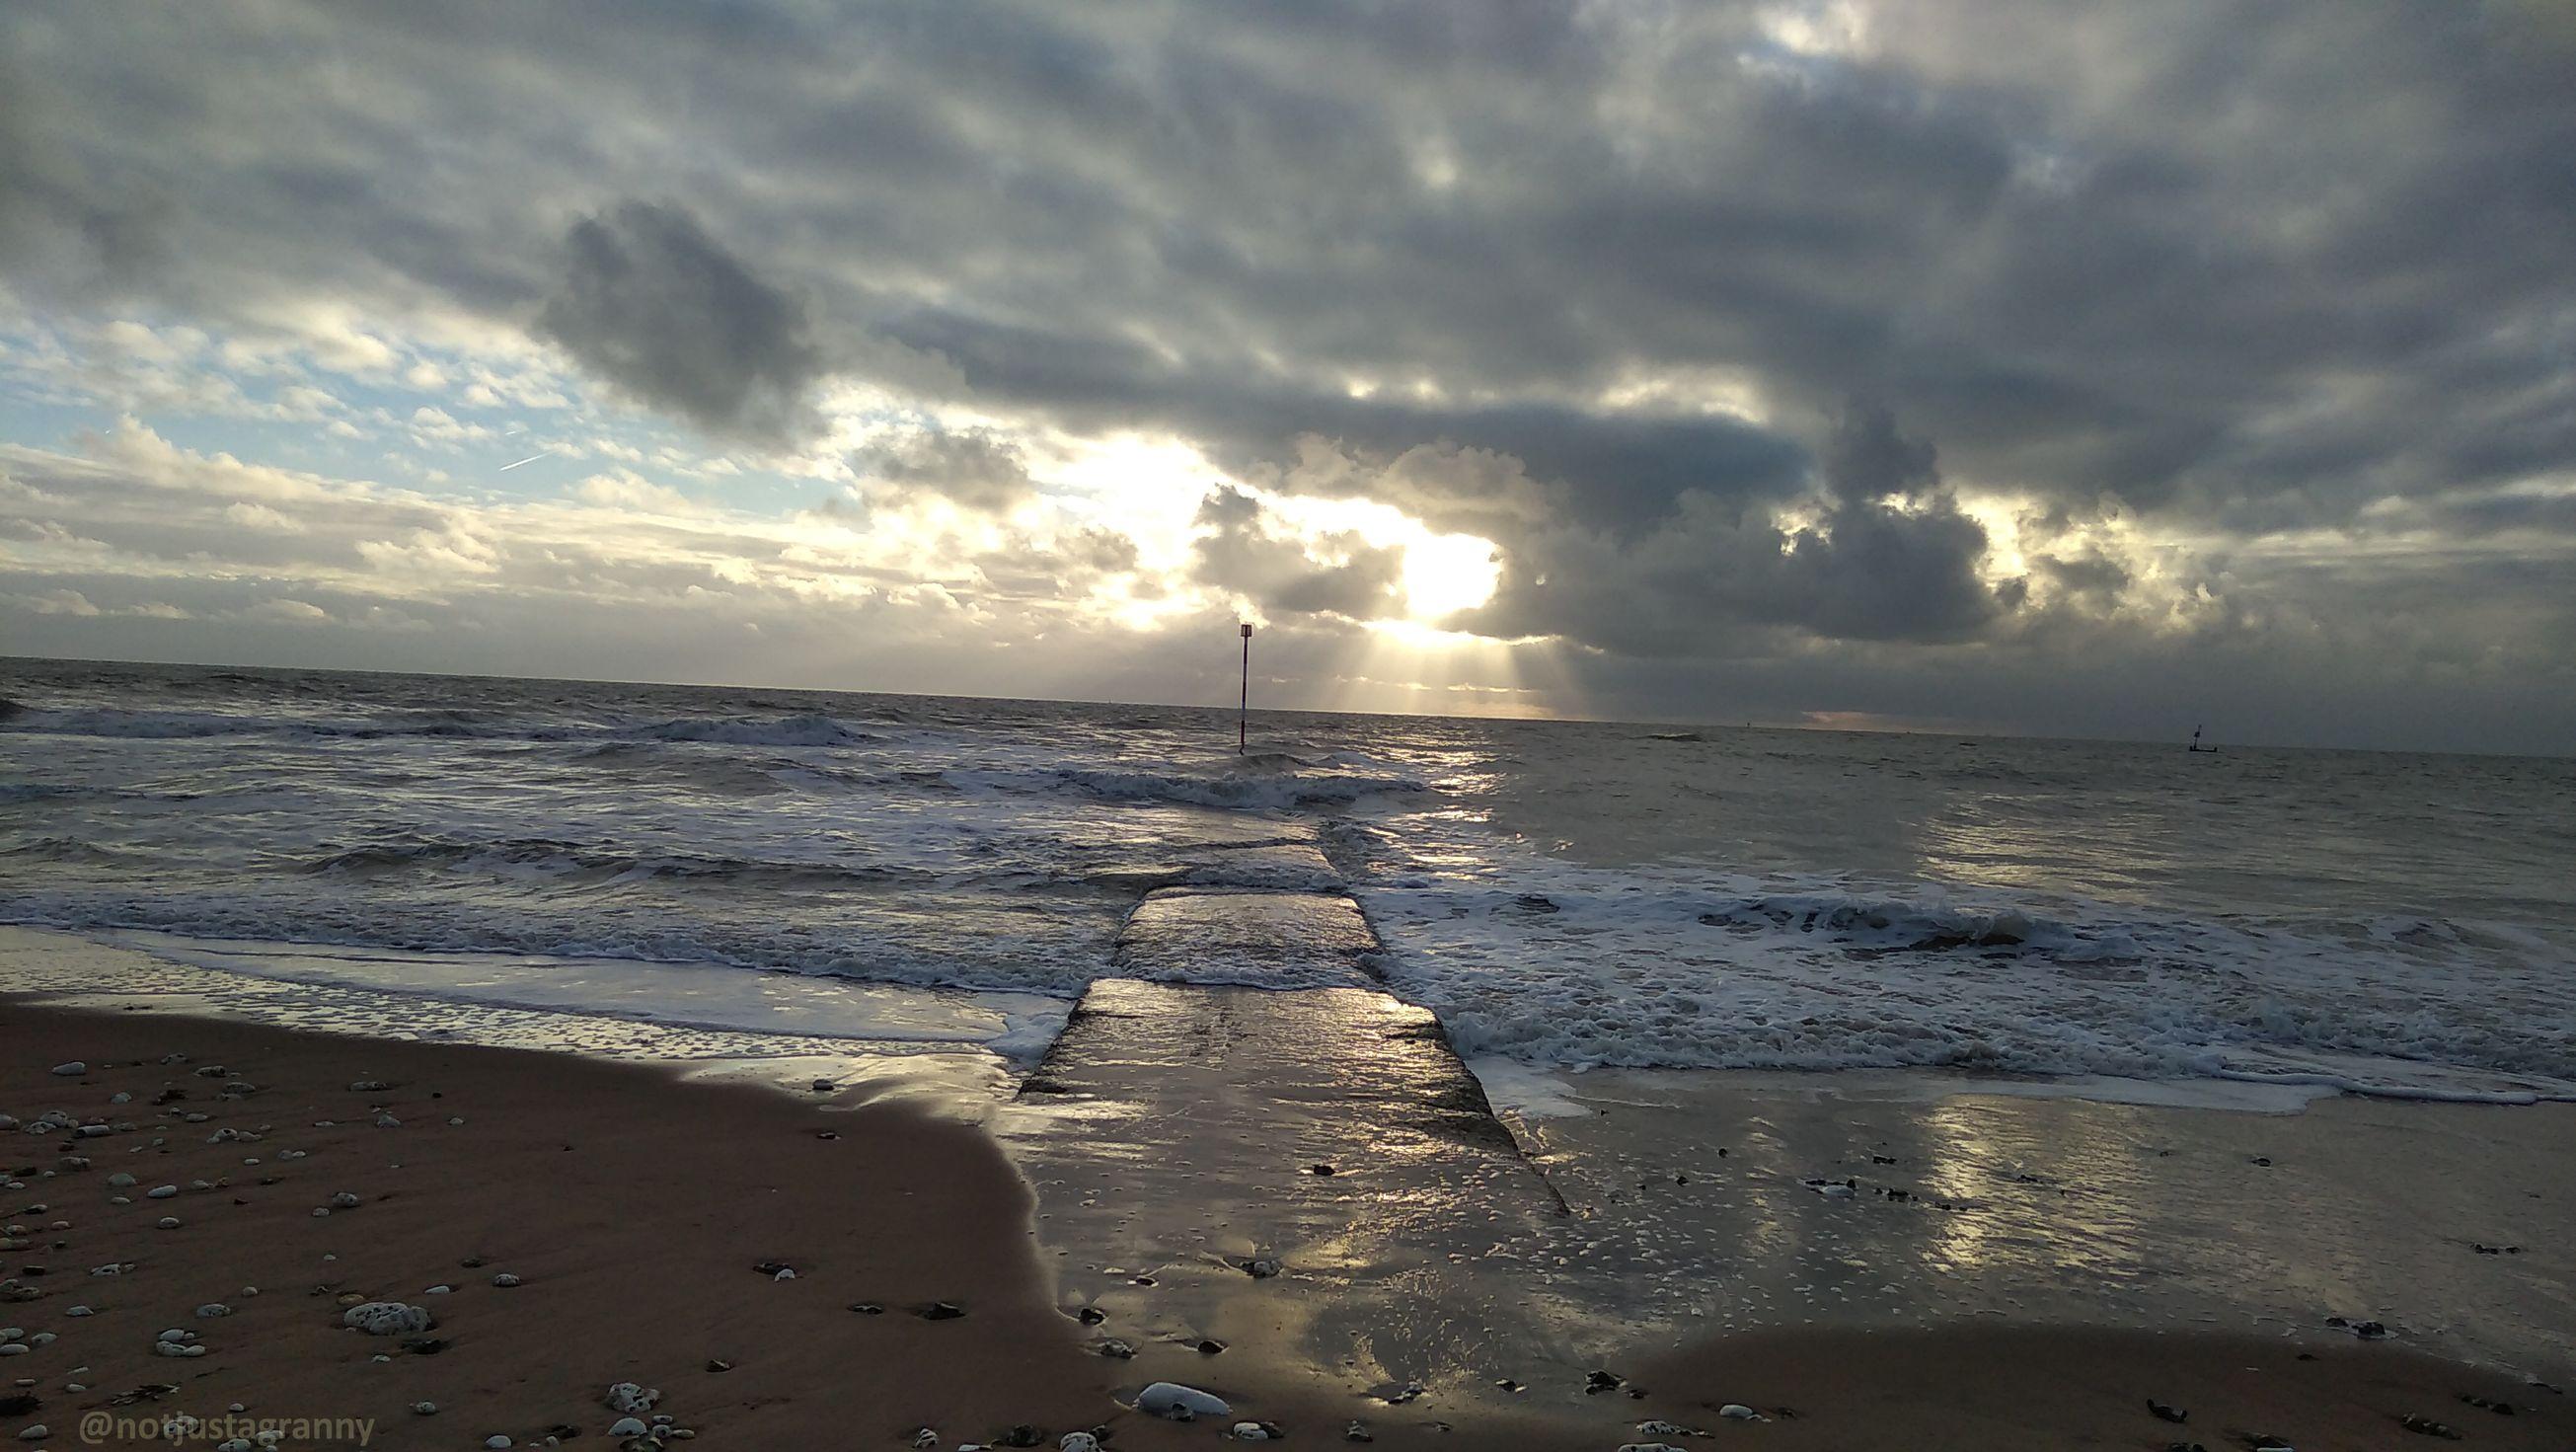 walk 1000 miles, walks along the english coast, walks in england, english channel , sunrise